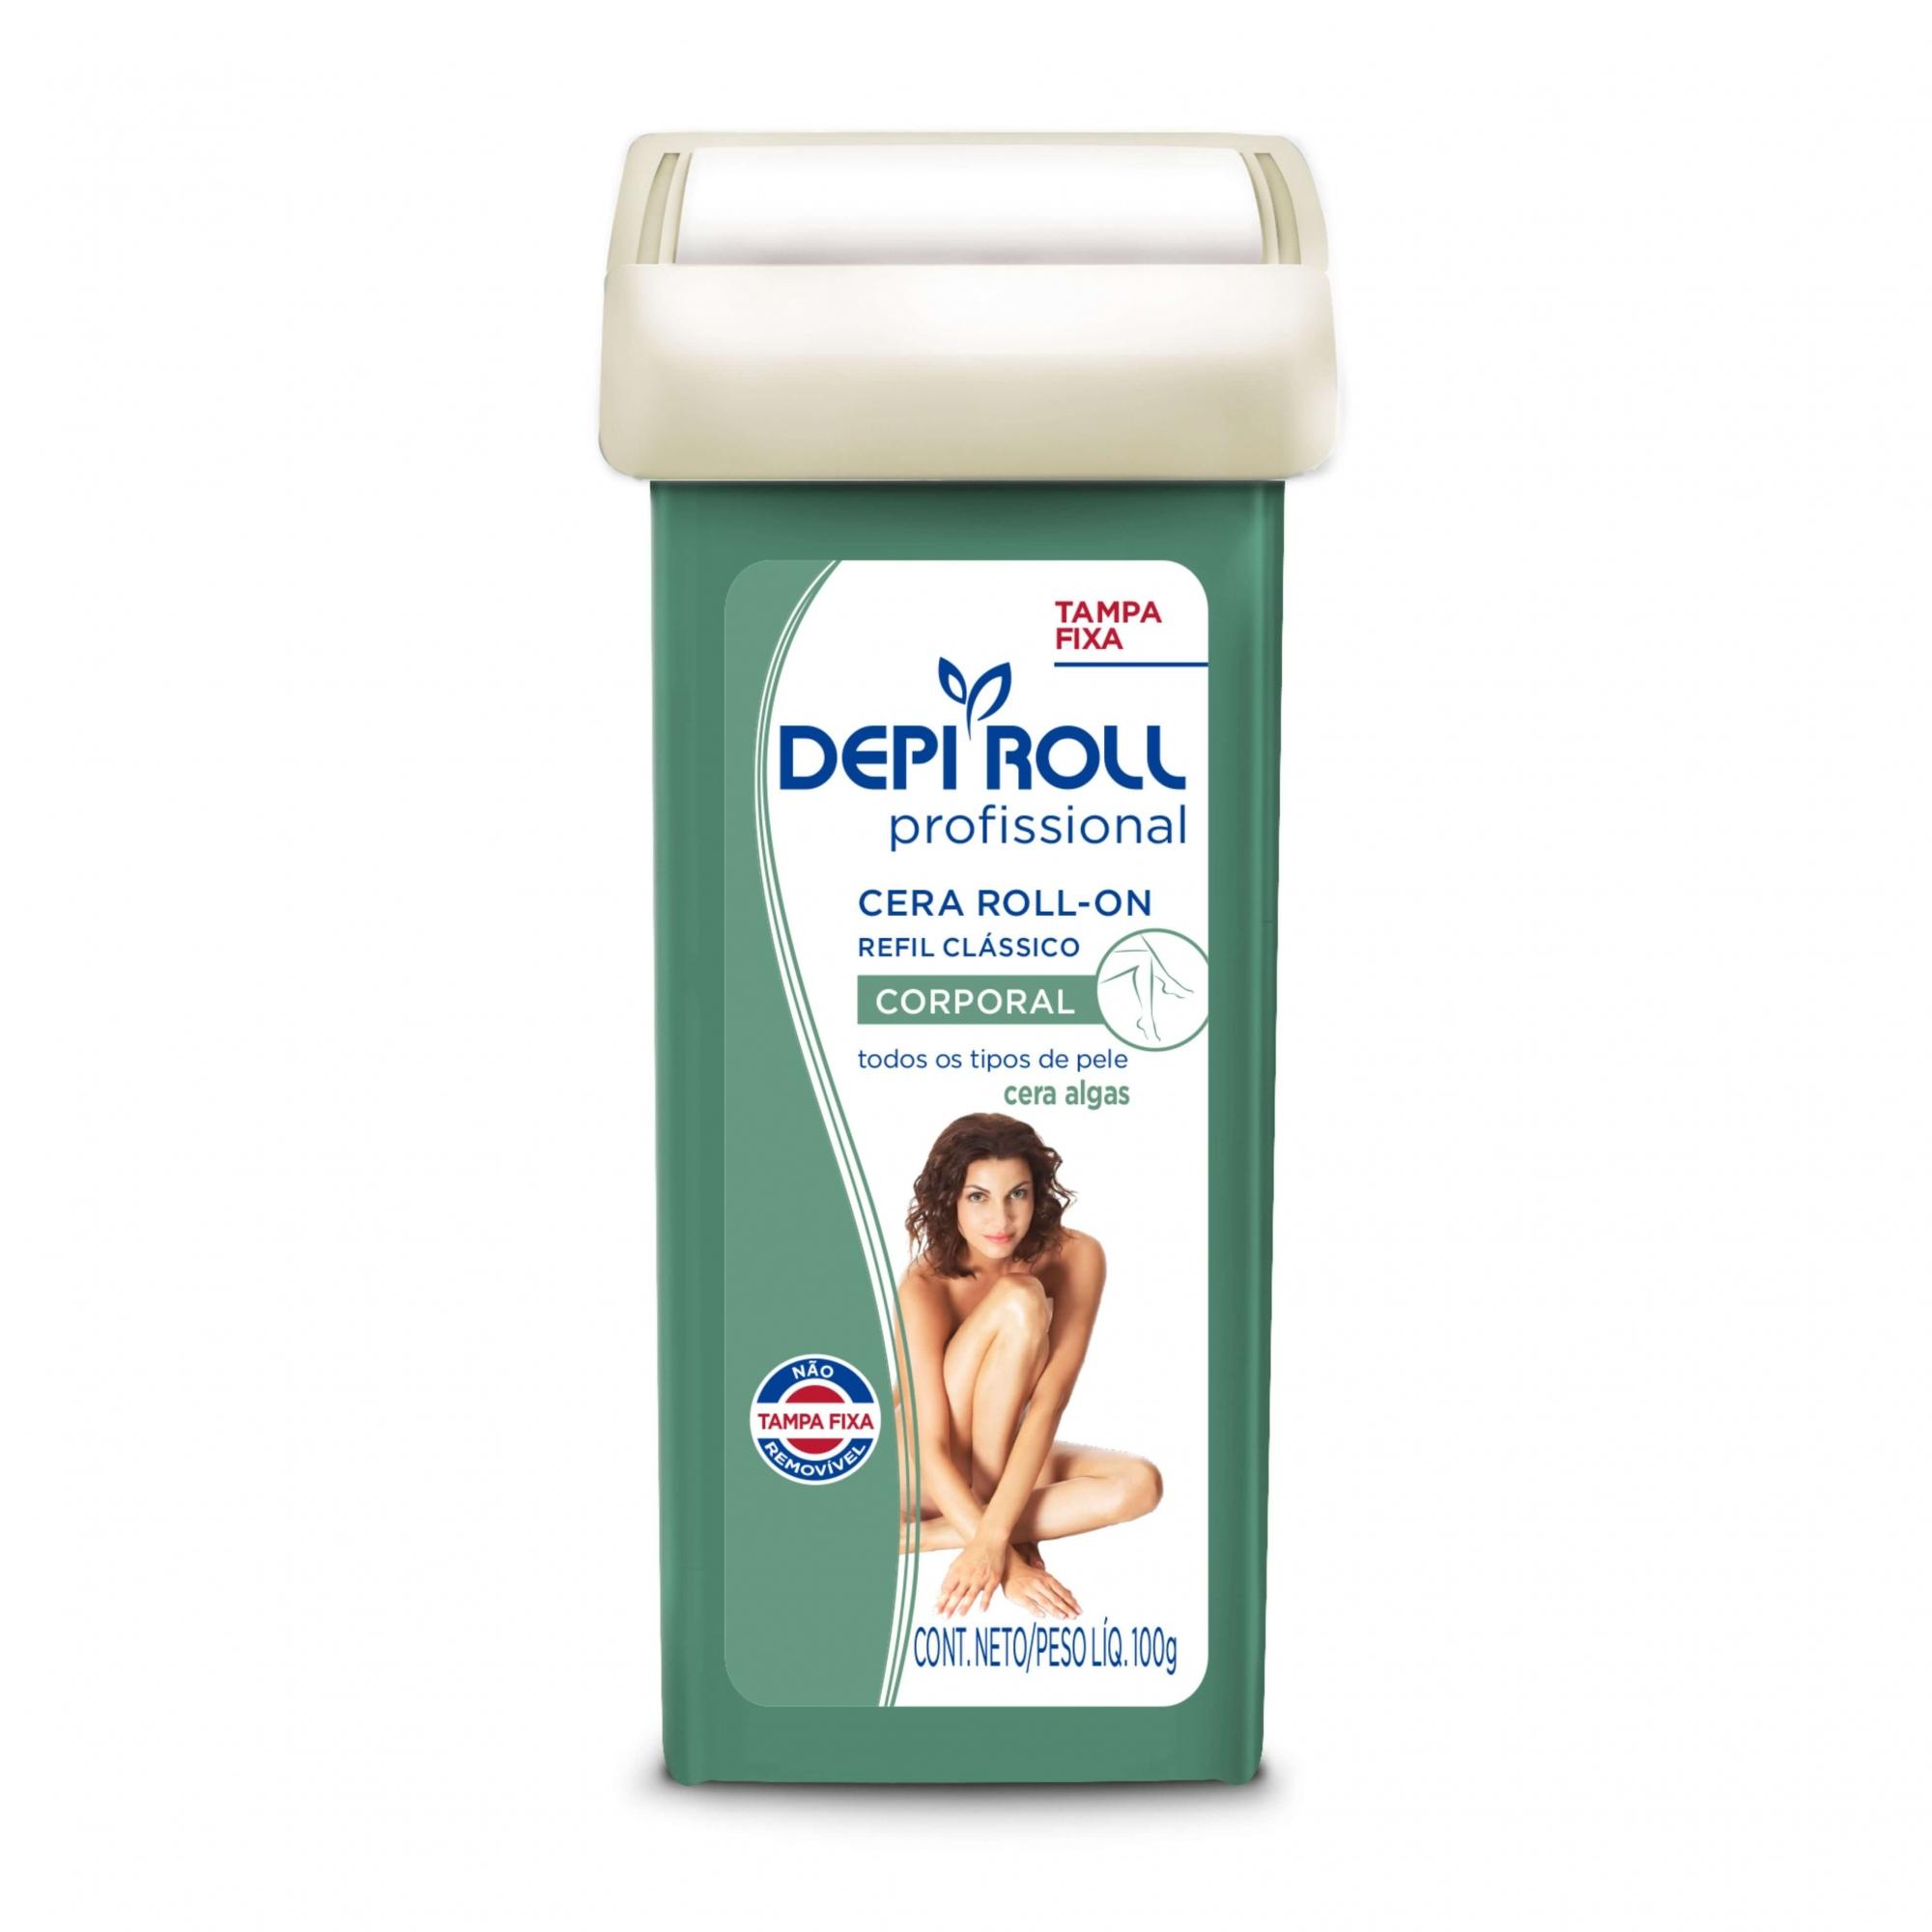 Refil Cera Corporal Roll-On Algas Depi Roll 100g